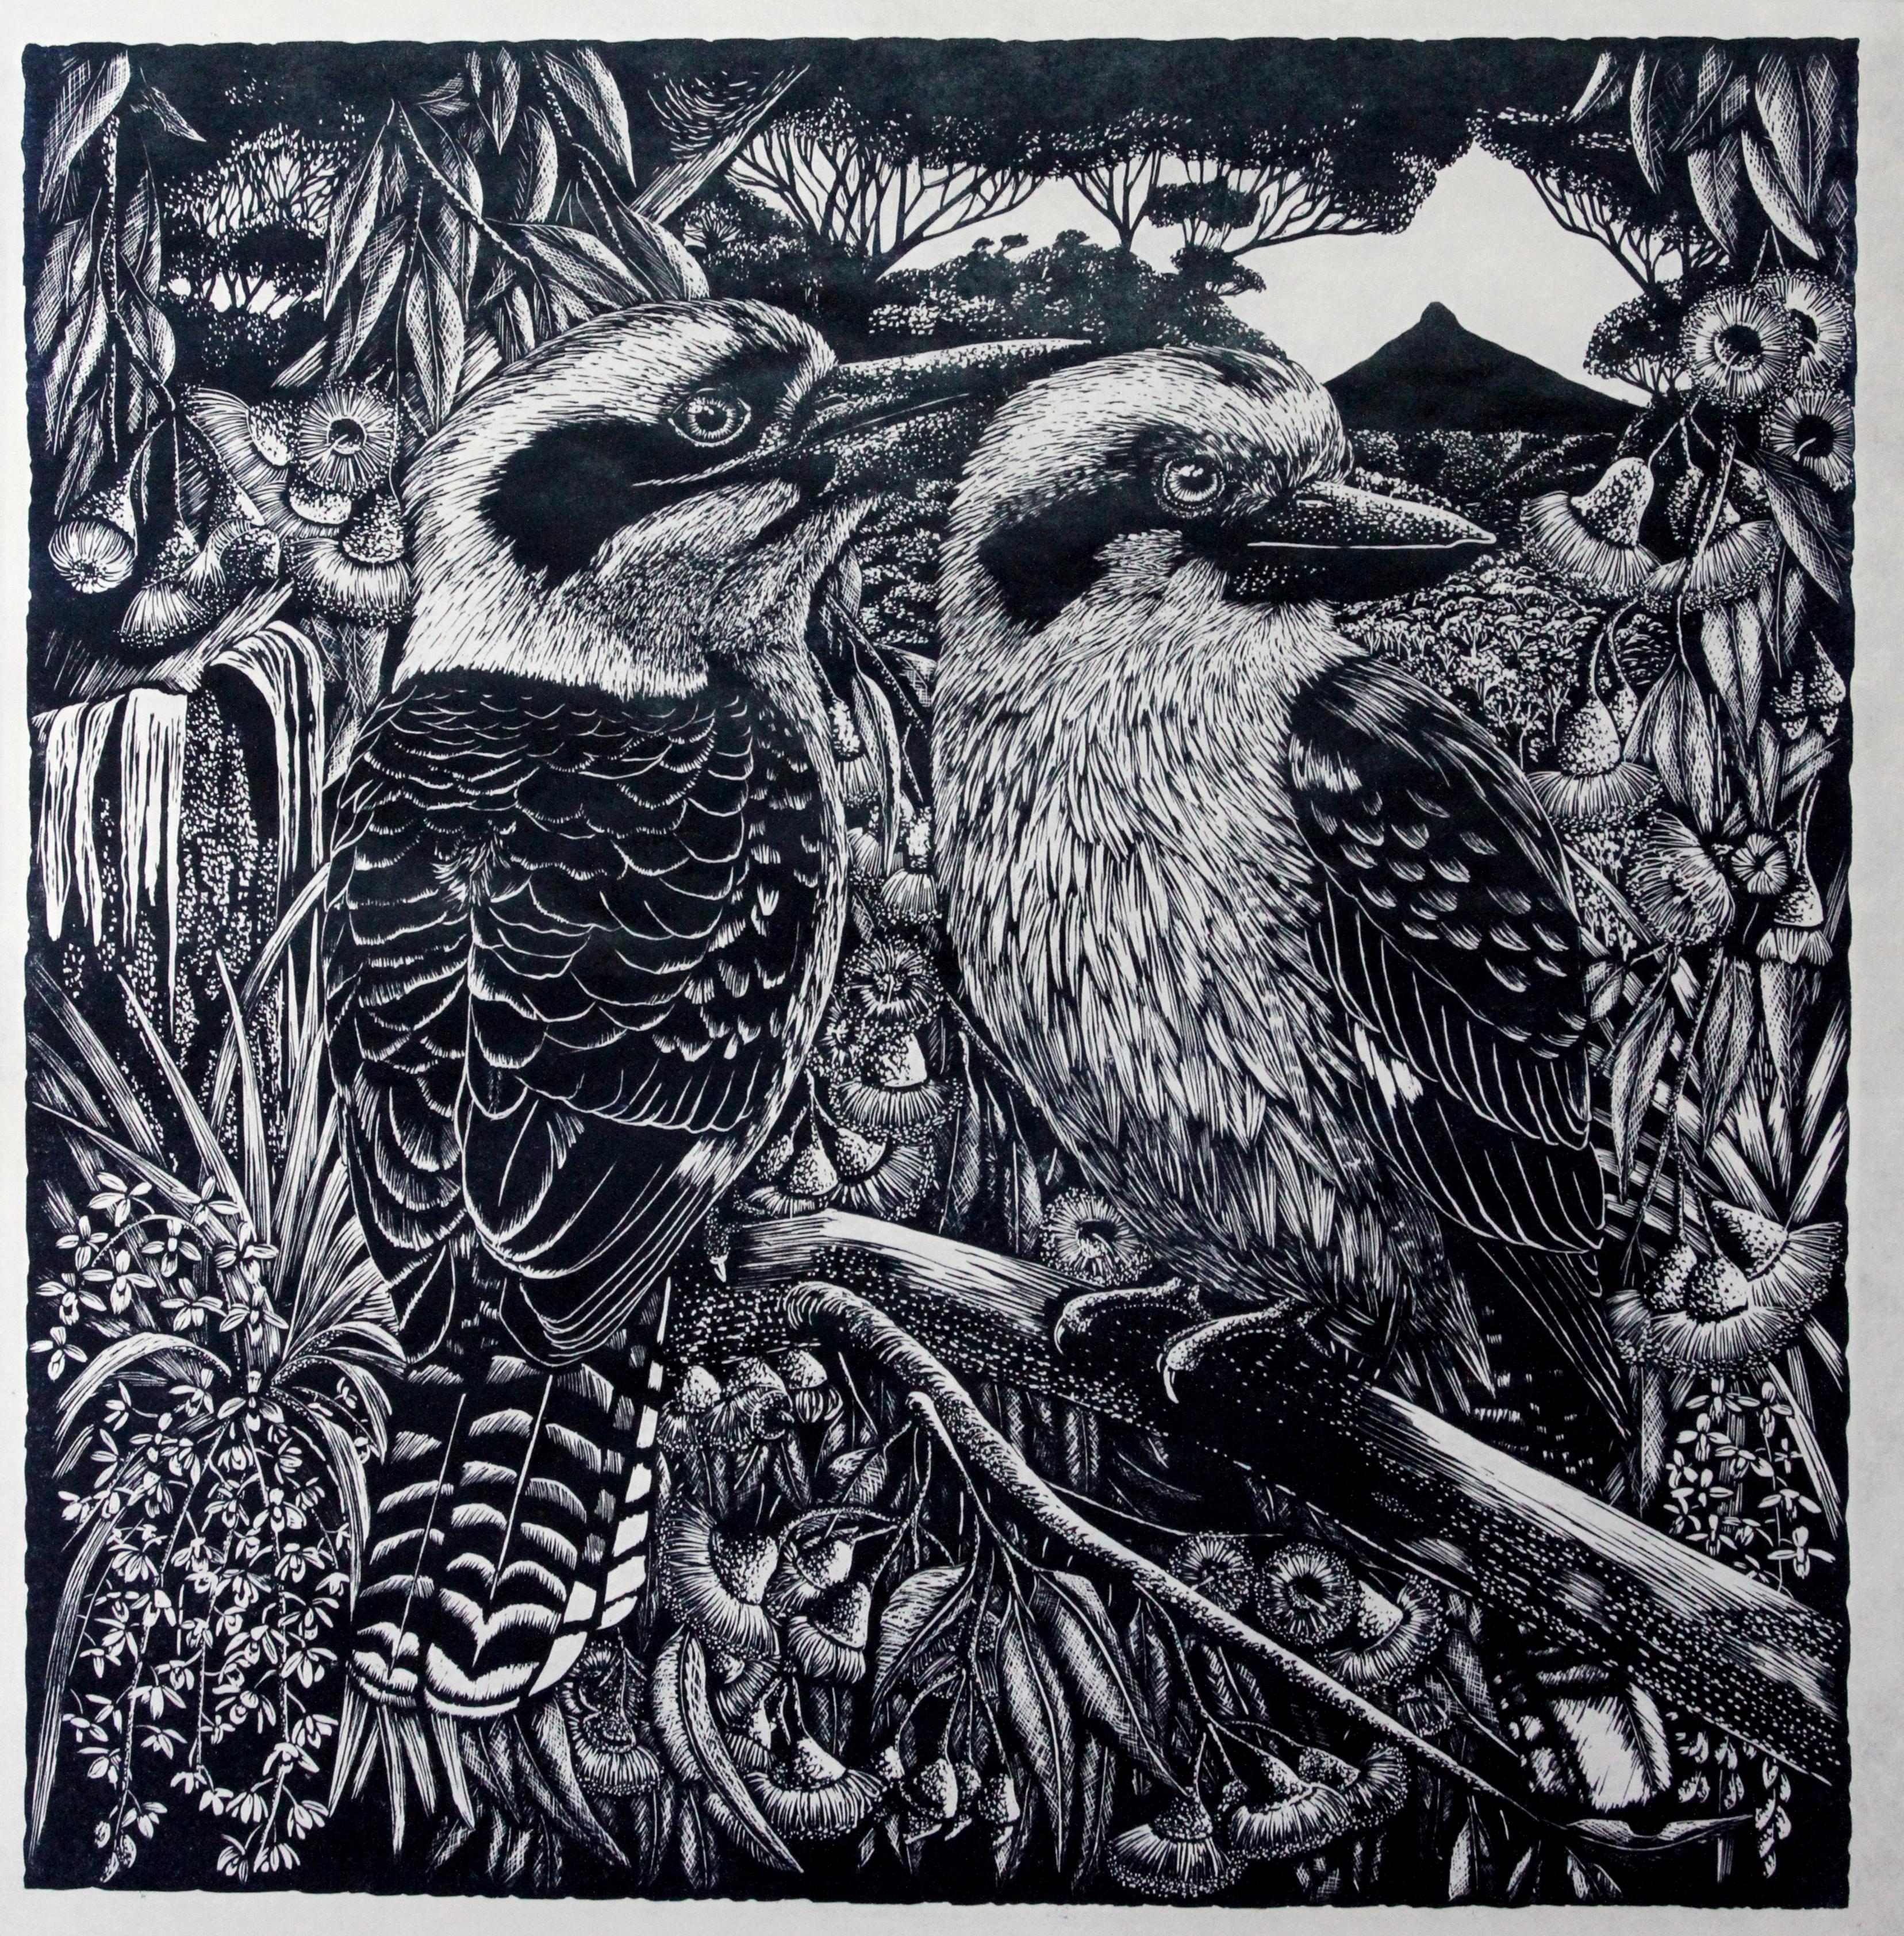 Dawn and Dusk - Relief Linocut Print of Australian Kookaburra's and Flowers